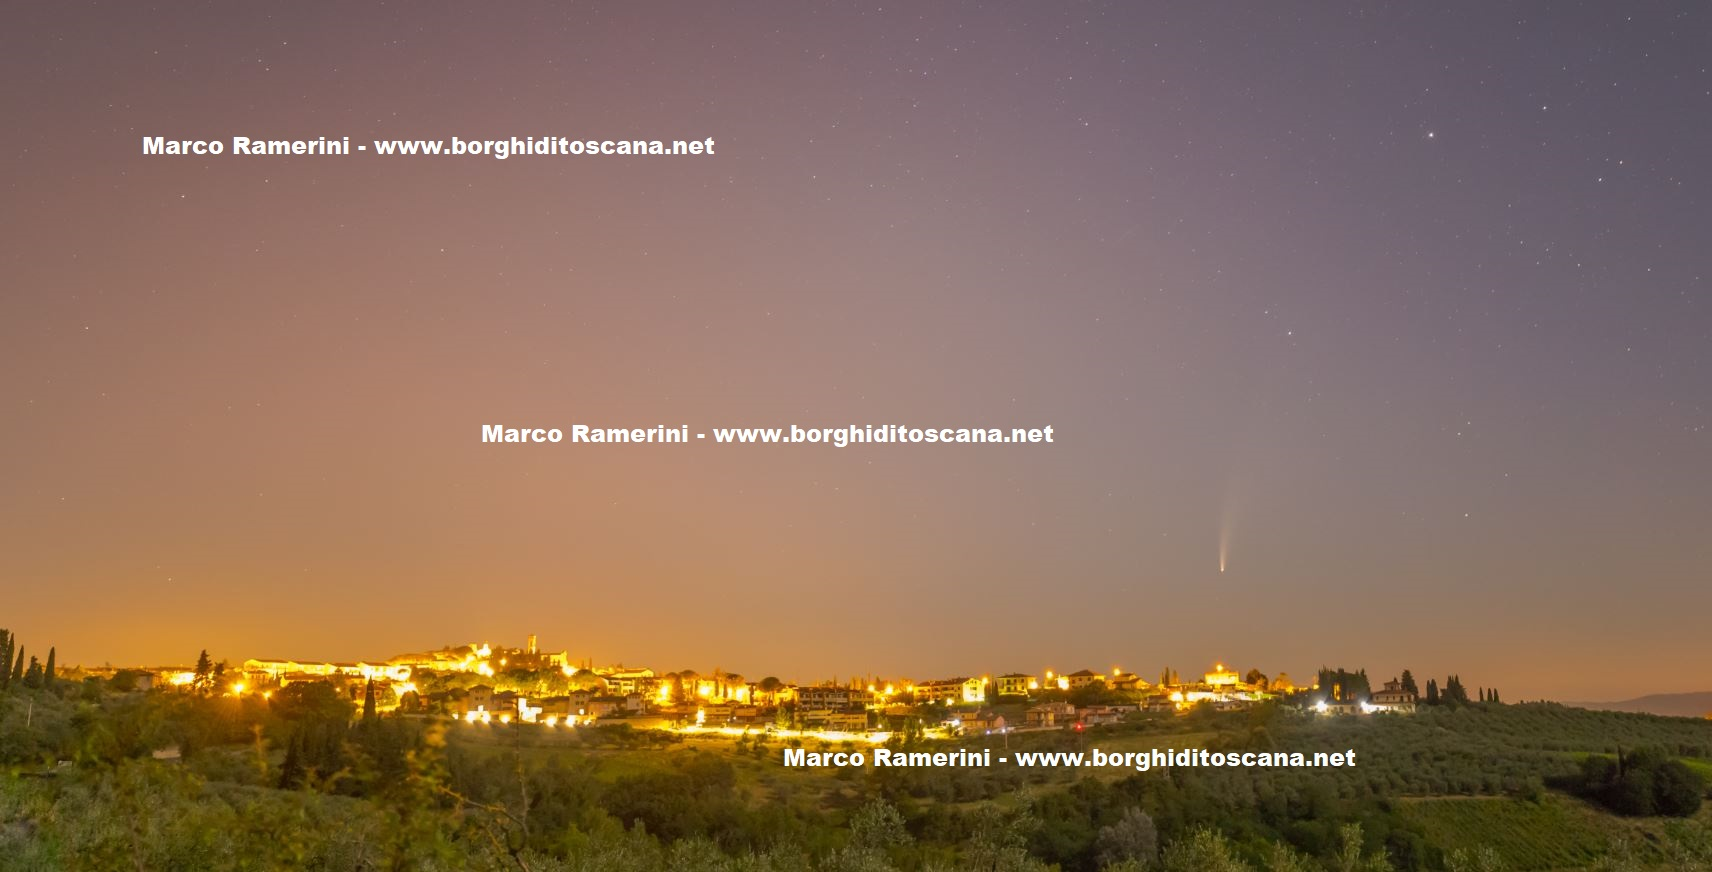 Barberino Val d'Elsa. Autore e Copyright Marco Ramerini.